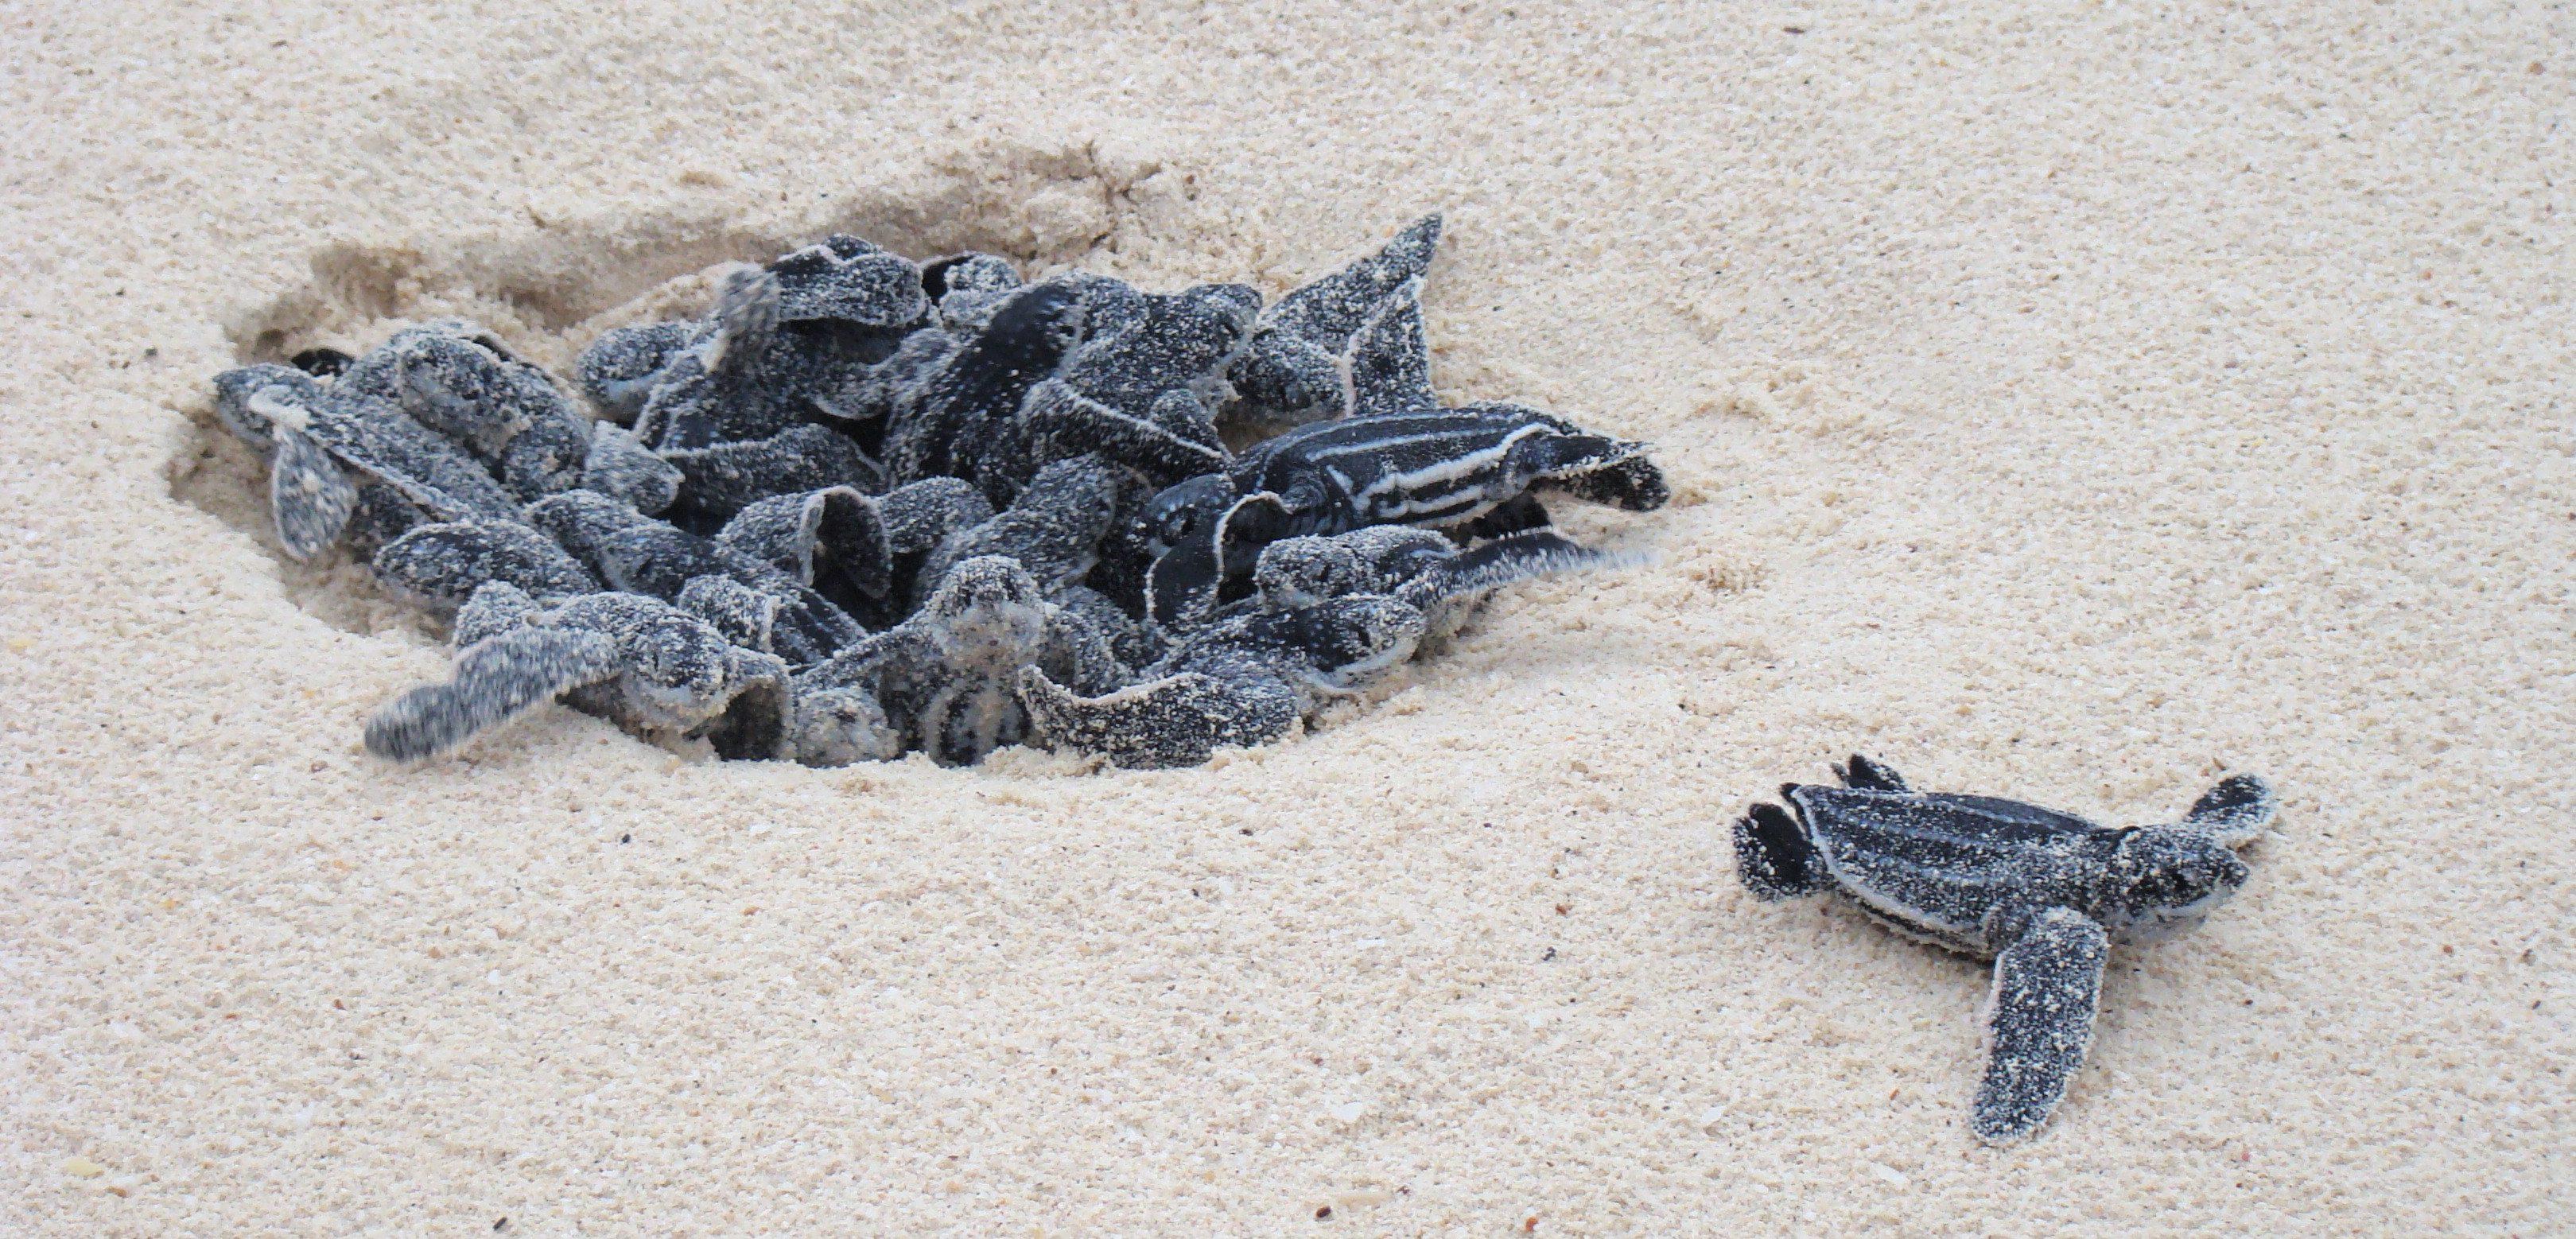 Florida Updates Sea Turtle Nesting Totals For